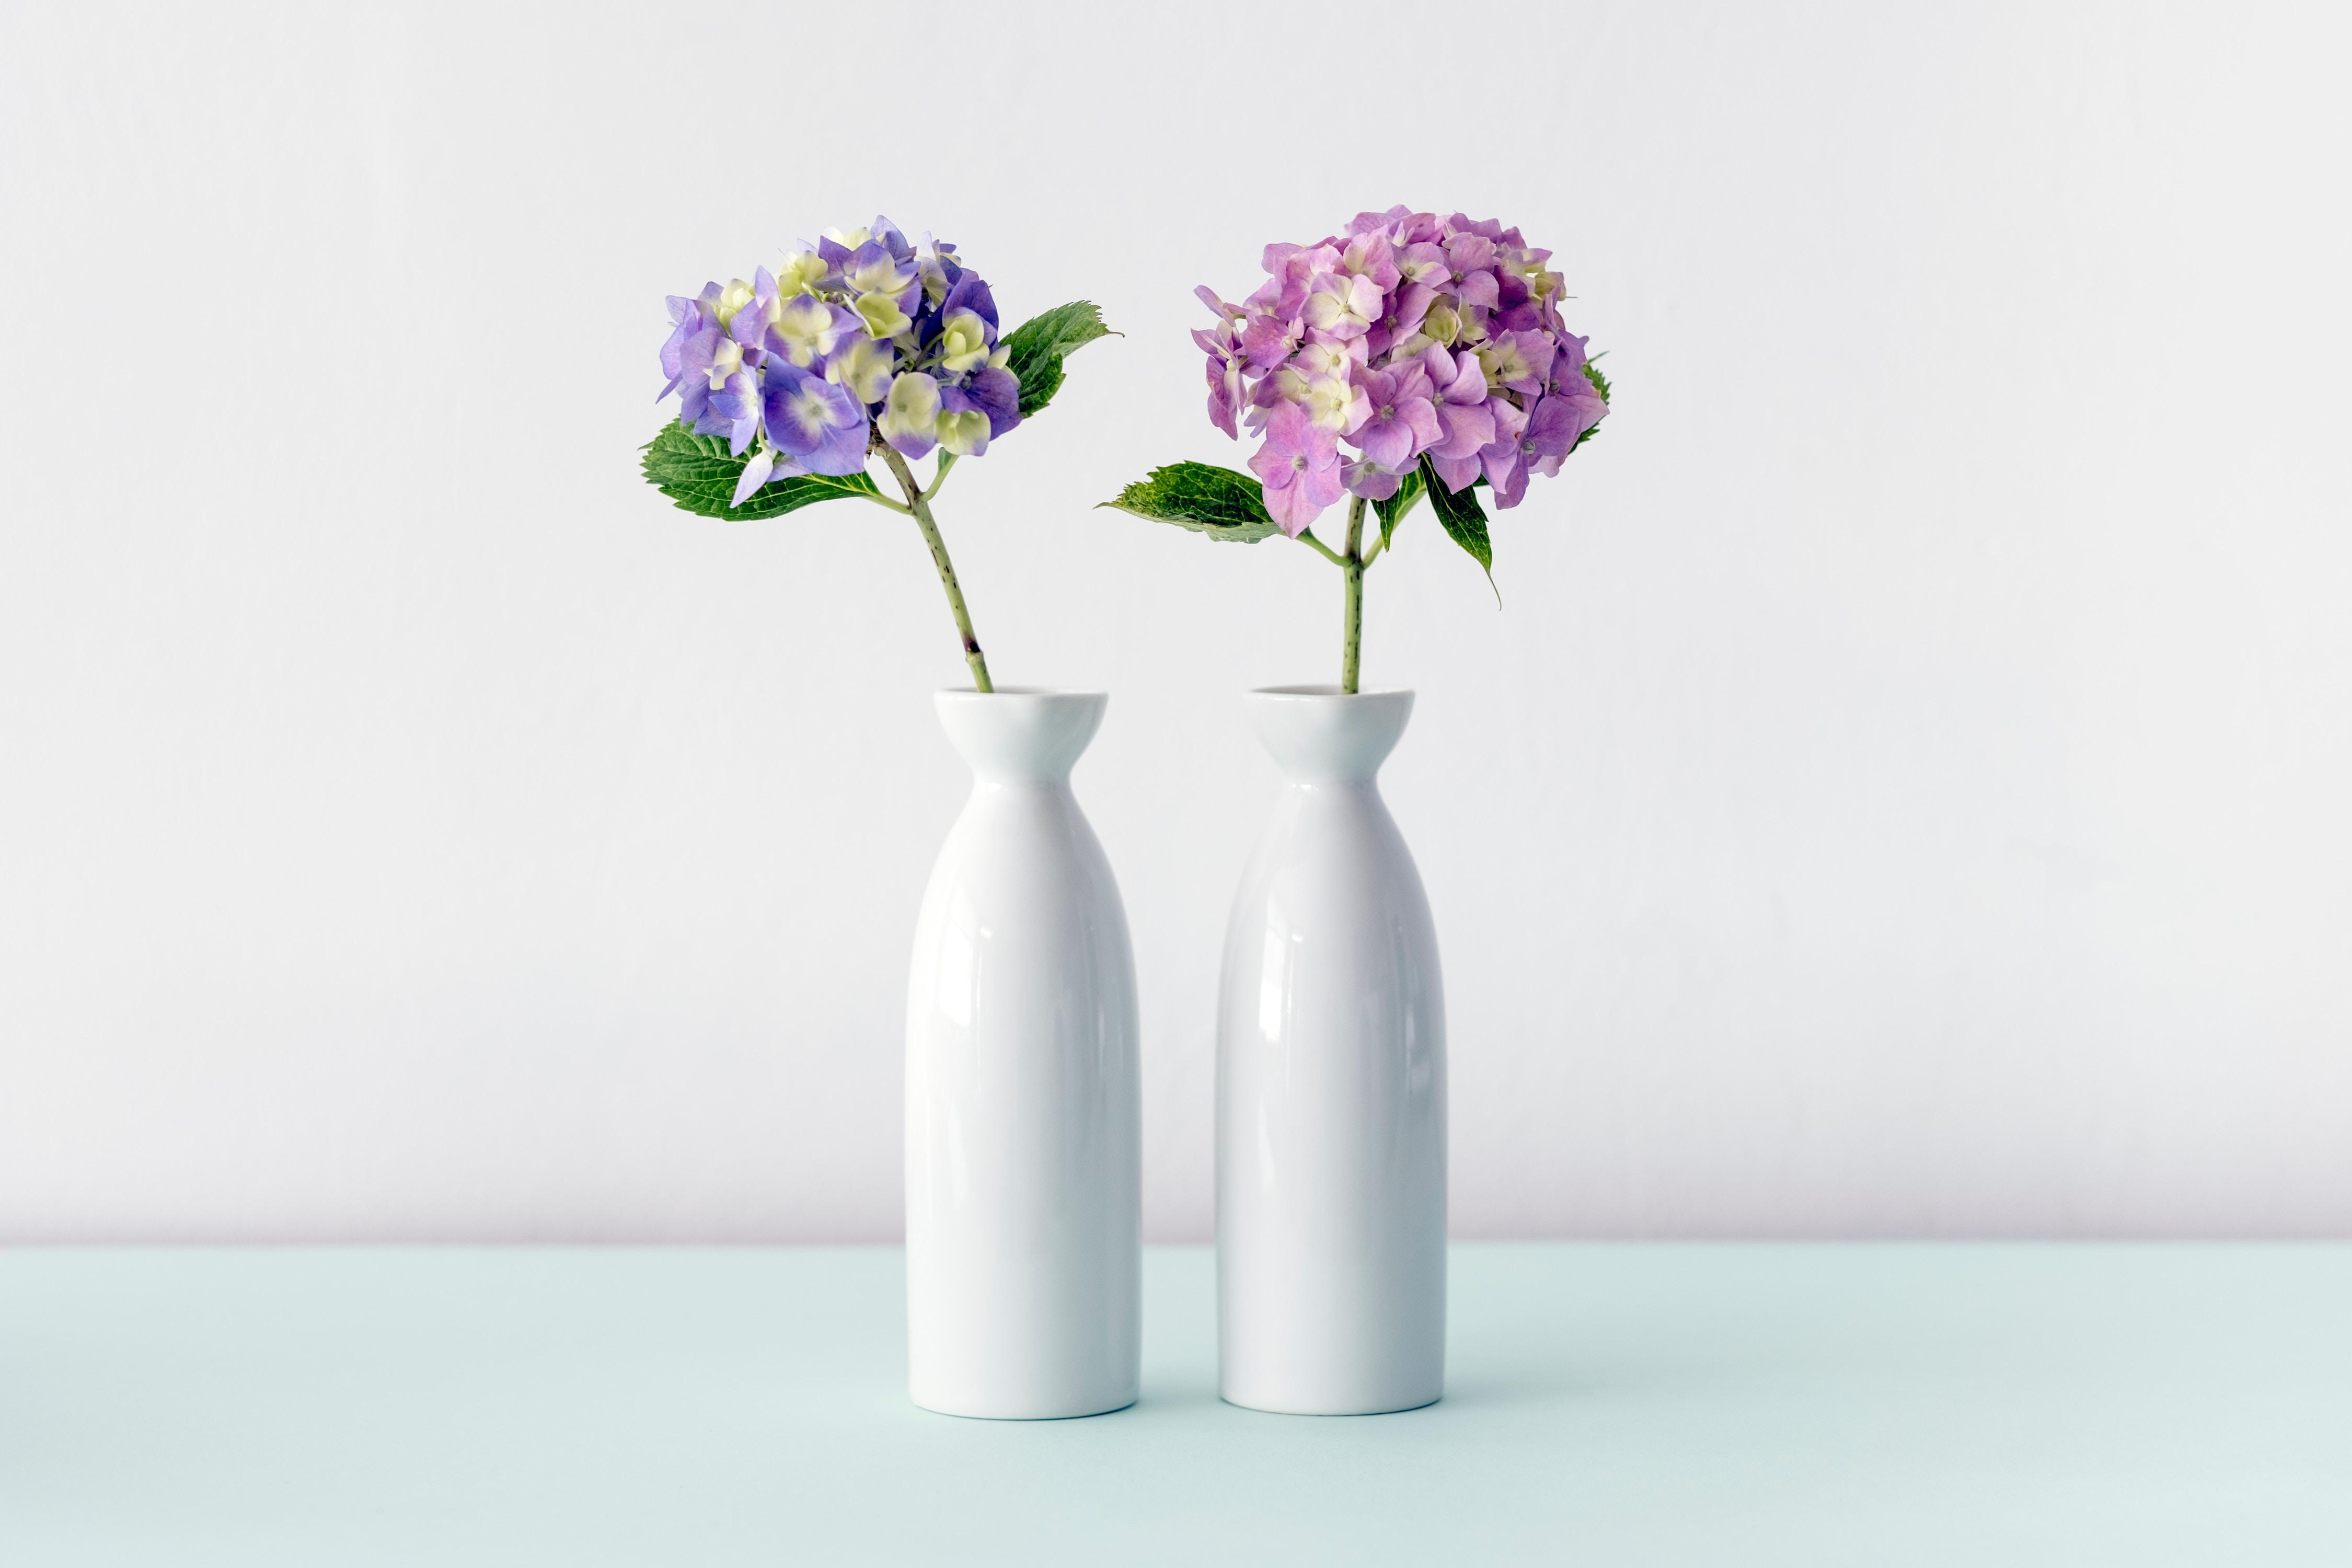 Vase Mit Blumen kostenlose foto blume lila vase cooles bild blumentopf cooles